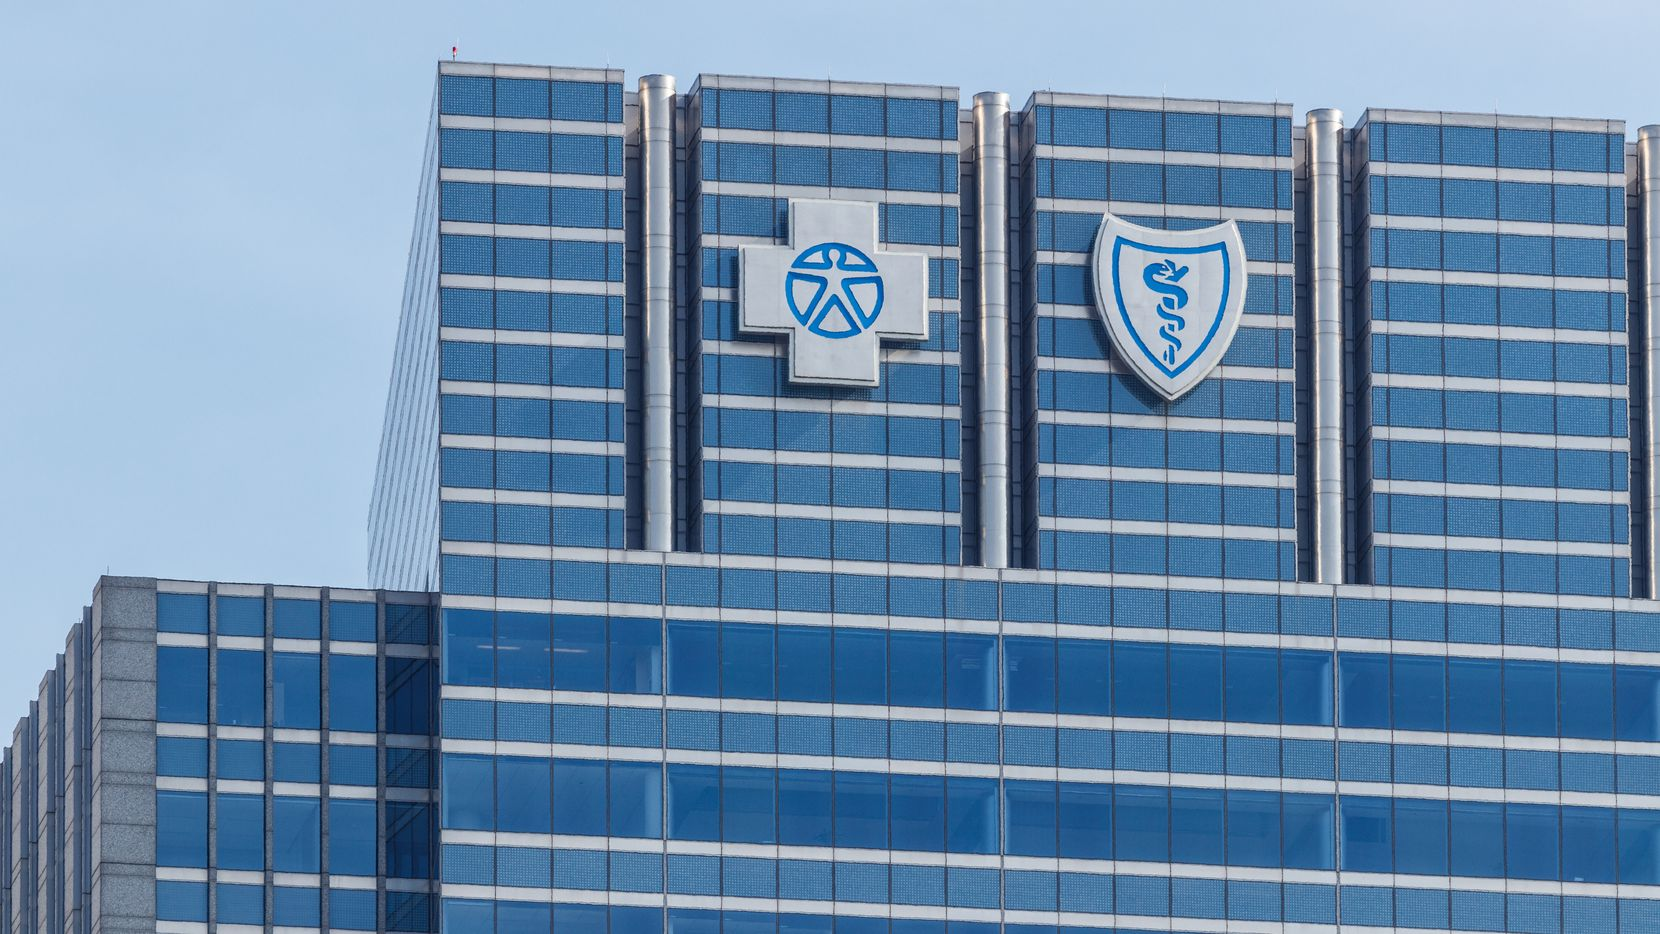 La aseguradora de cobertura médica Blue Cross Blue Shield.